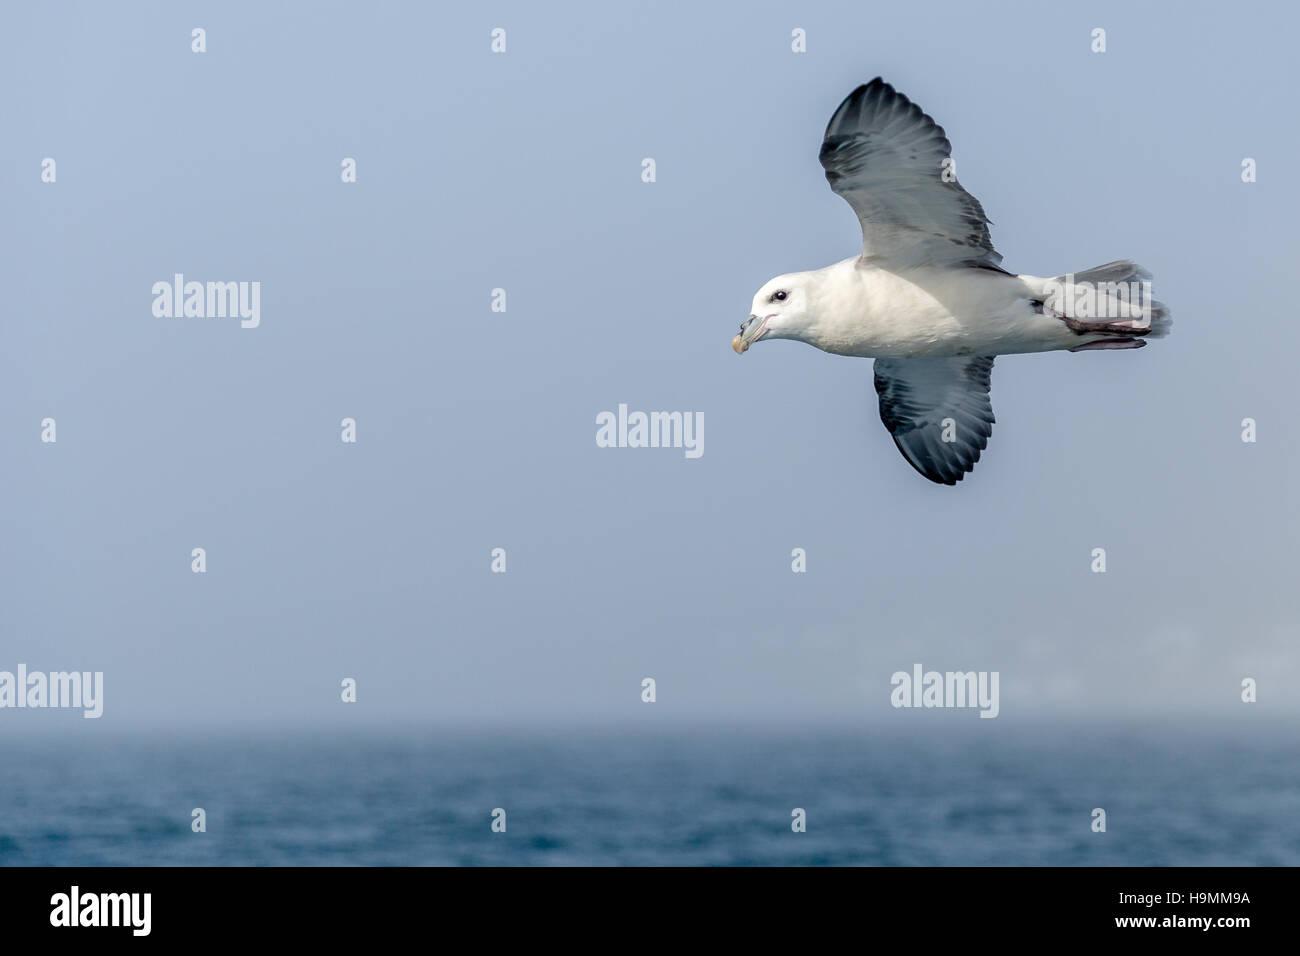 Gull, seagull, seabird, family Laridae, suborder Lari, sea, details - Stock Image